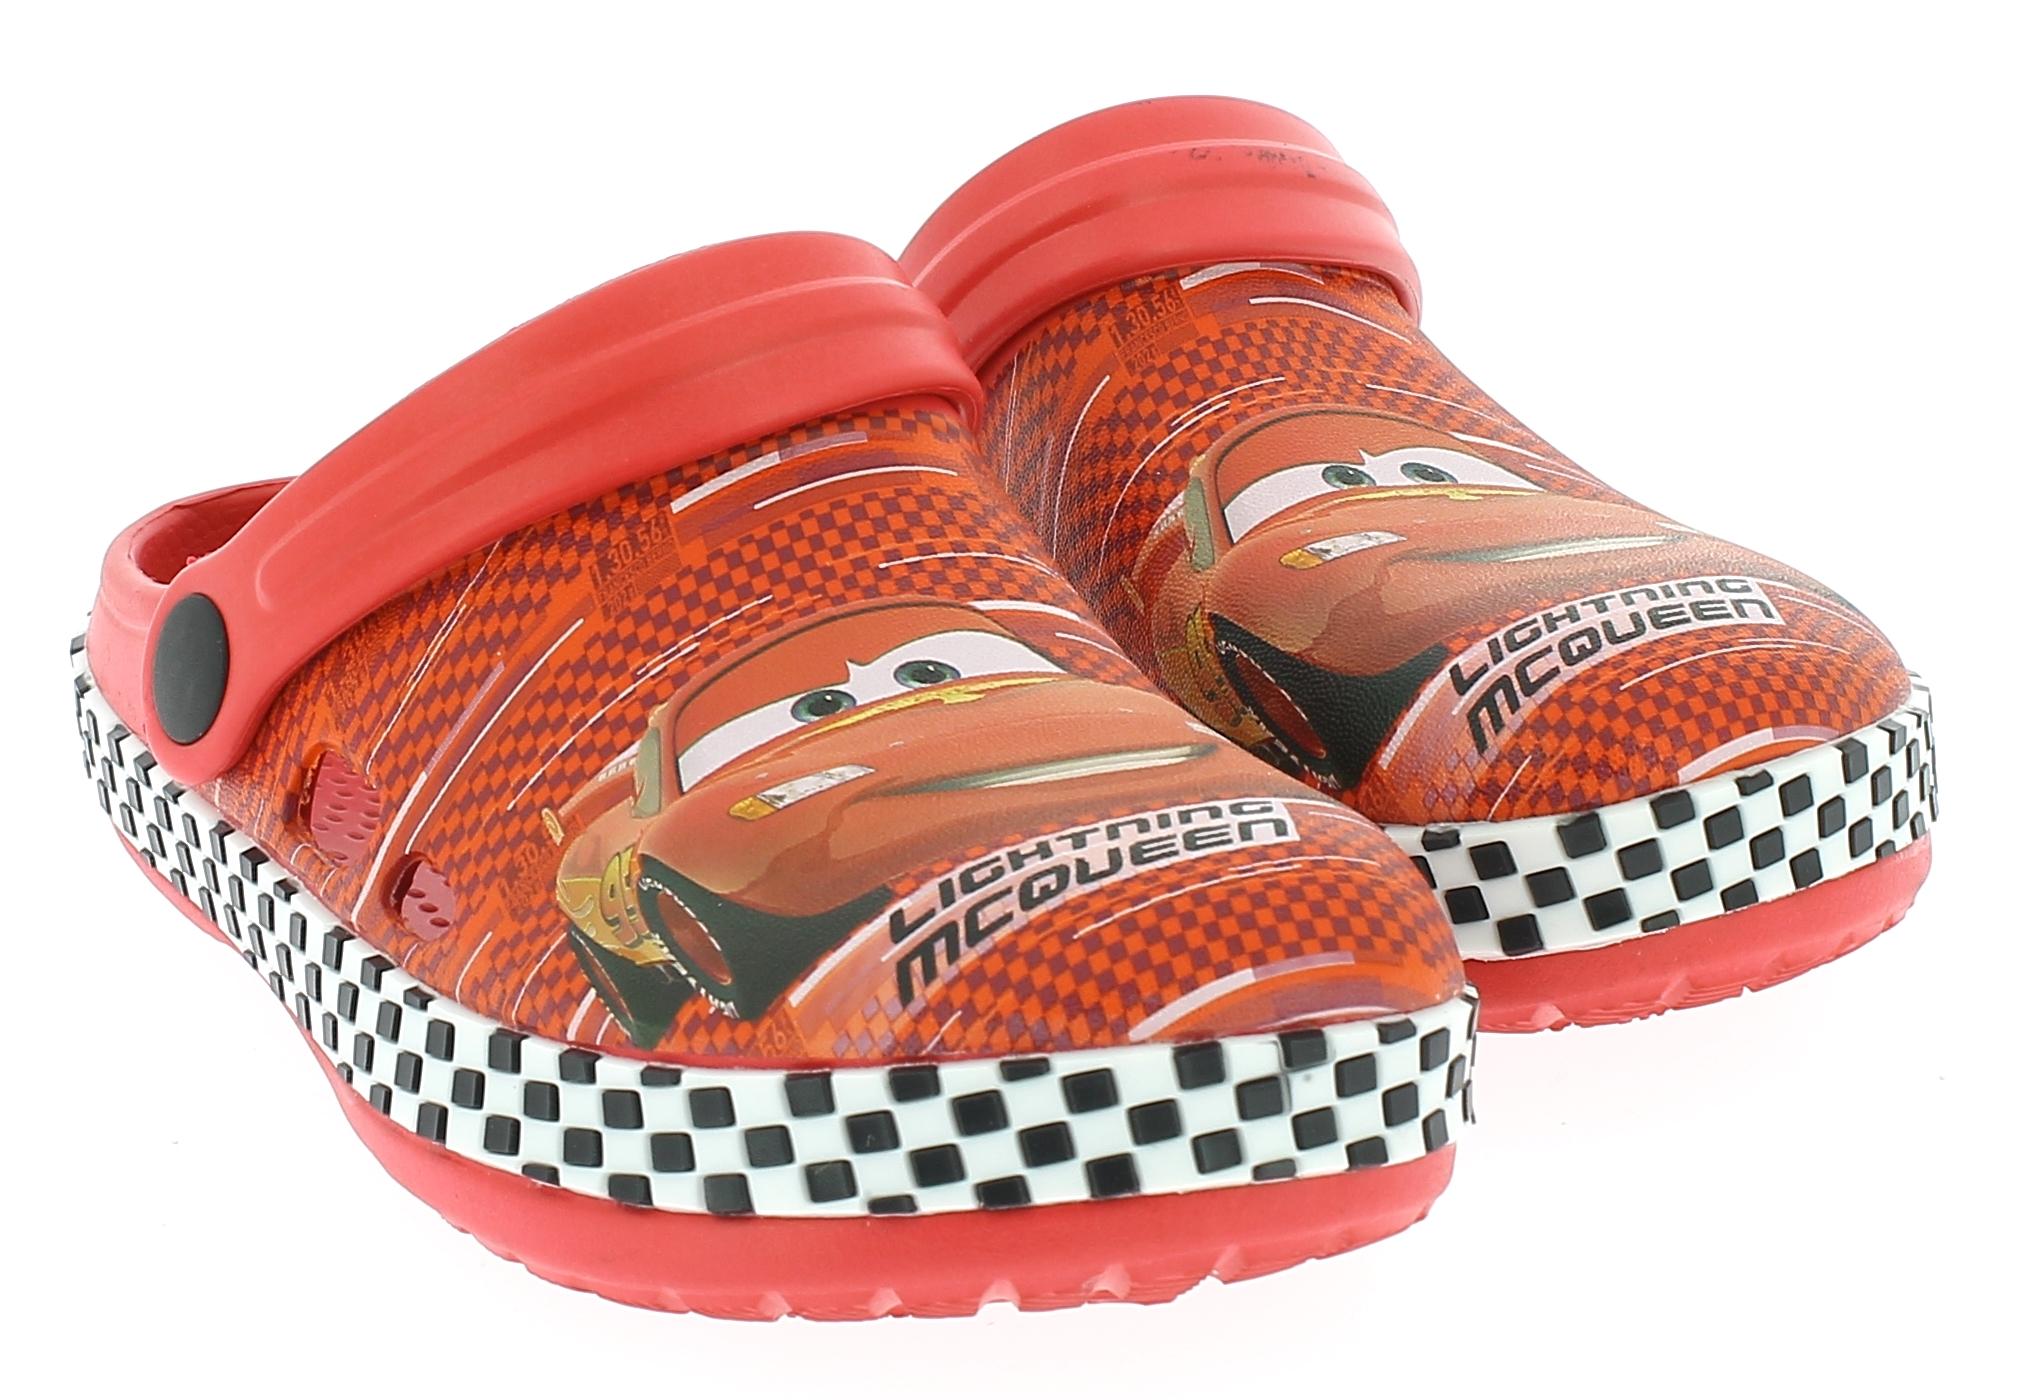 CARS Αγορίστικη Σαγιονάρα S17532L 28/35 Κόκκινο - Κόκκινο - S17532L RED-red-30/31/4/19/86